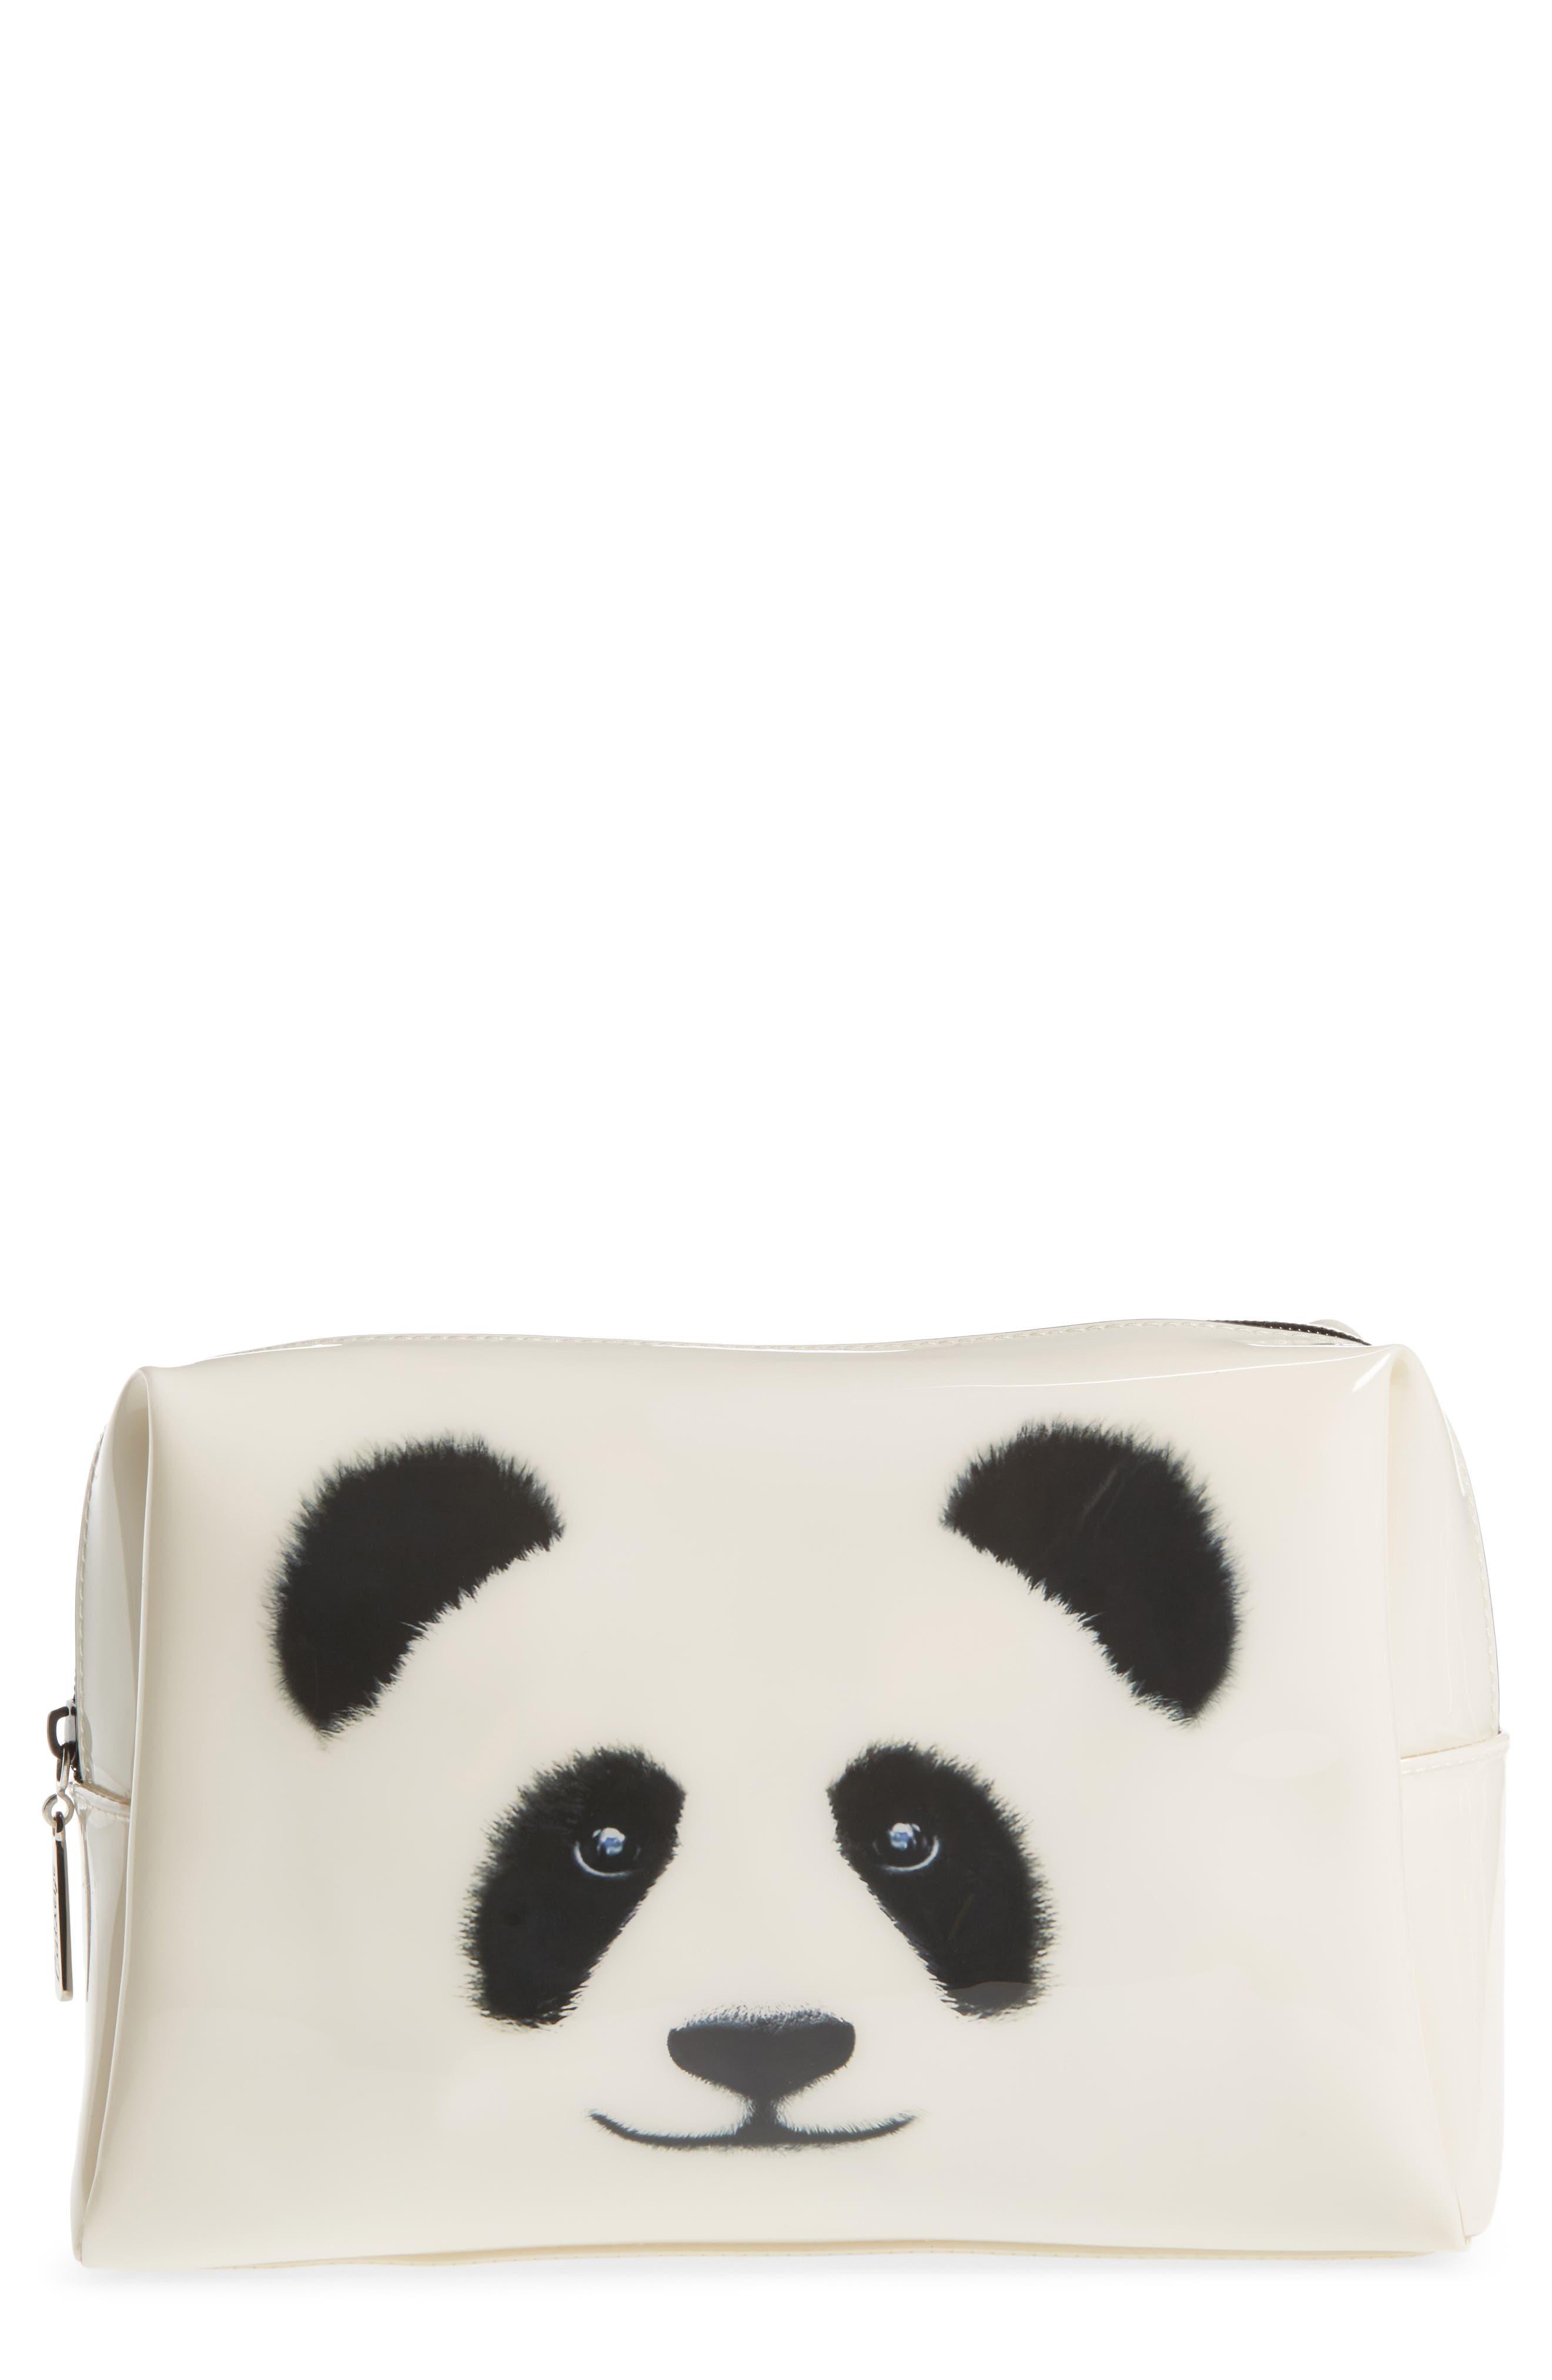 Big Face Panda Large Cosmetics Bag,                         Main,                         color, 100